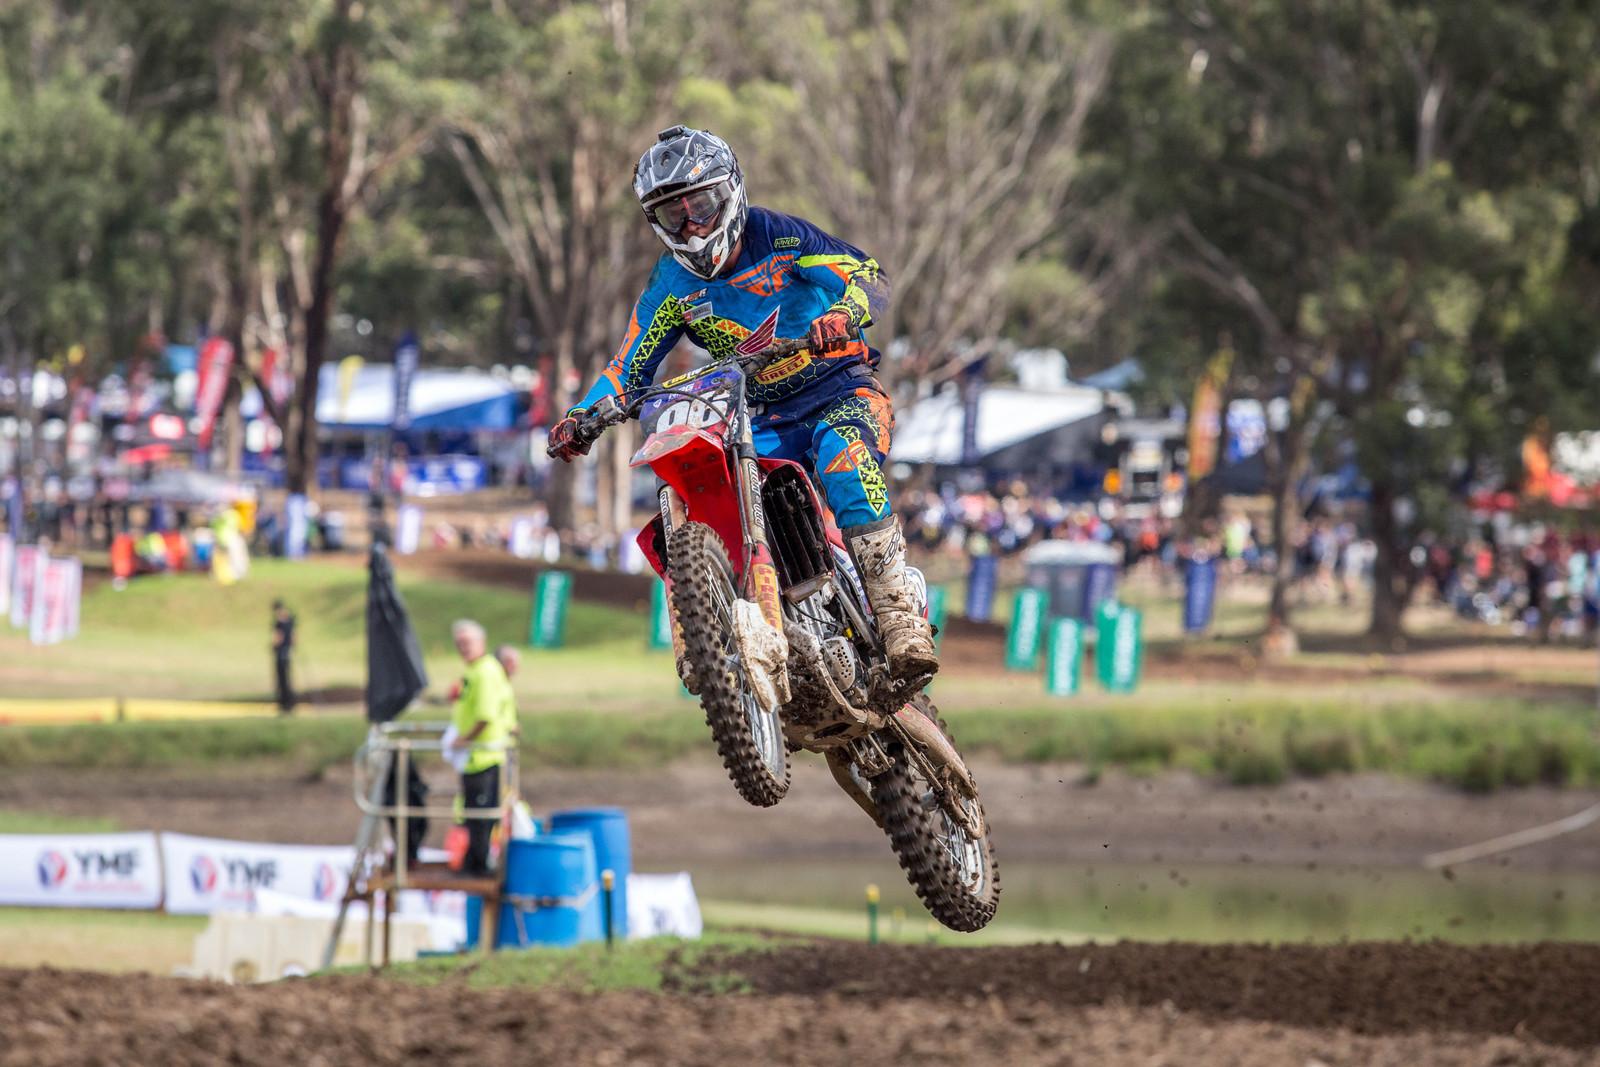 Kyle Webster - Australian Motul Motocross Nationals Round 2, Appin - Motocross Pictures - Vital MX